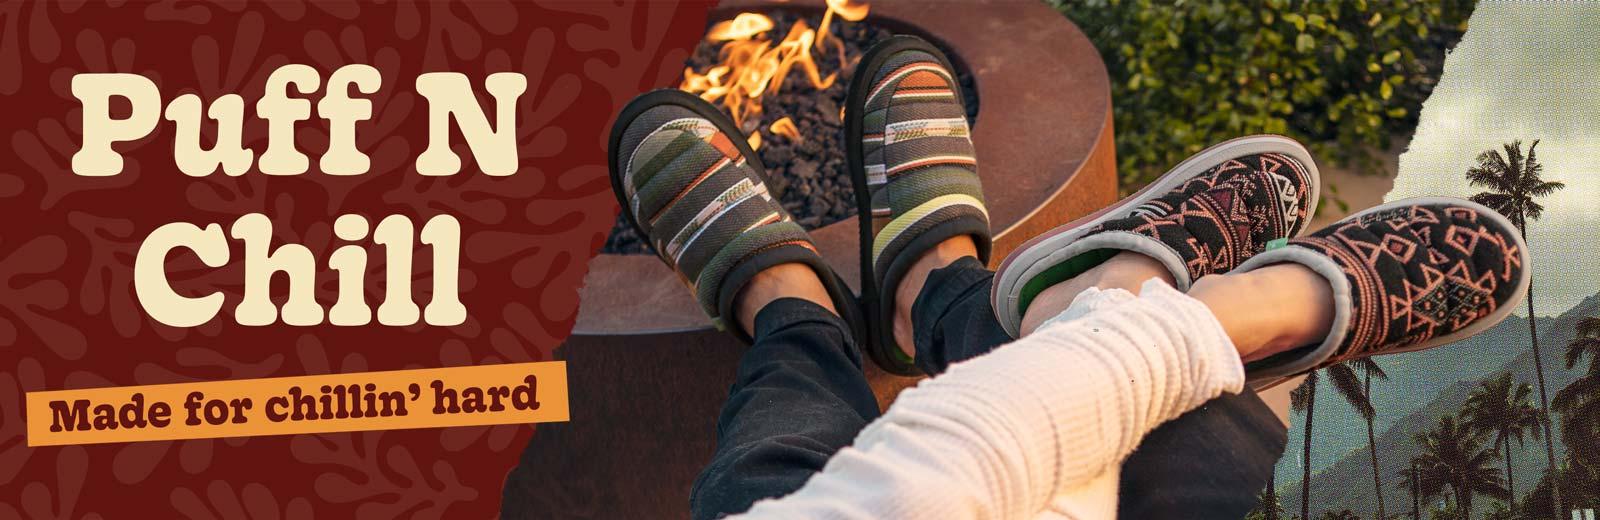 Men and women feet wearing Puff N Chill shoes.